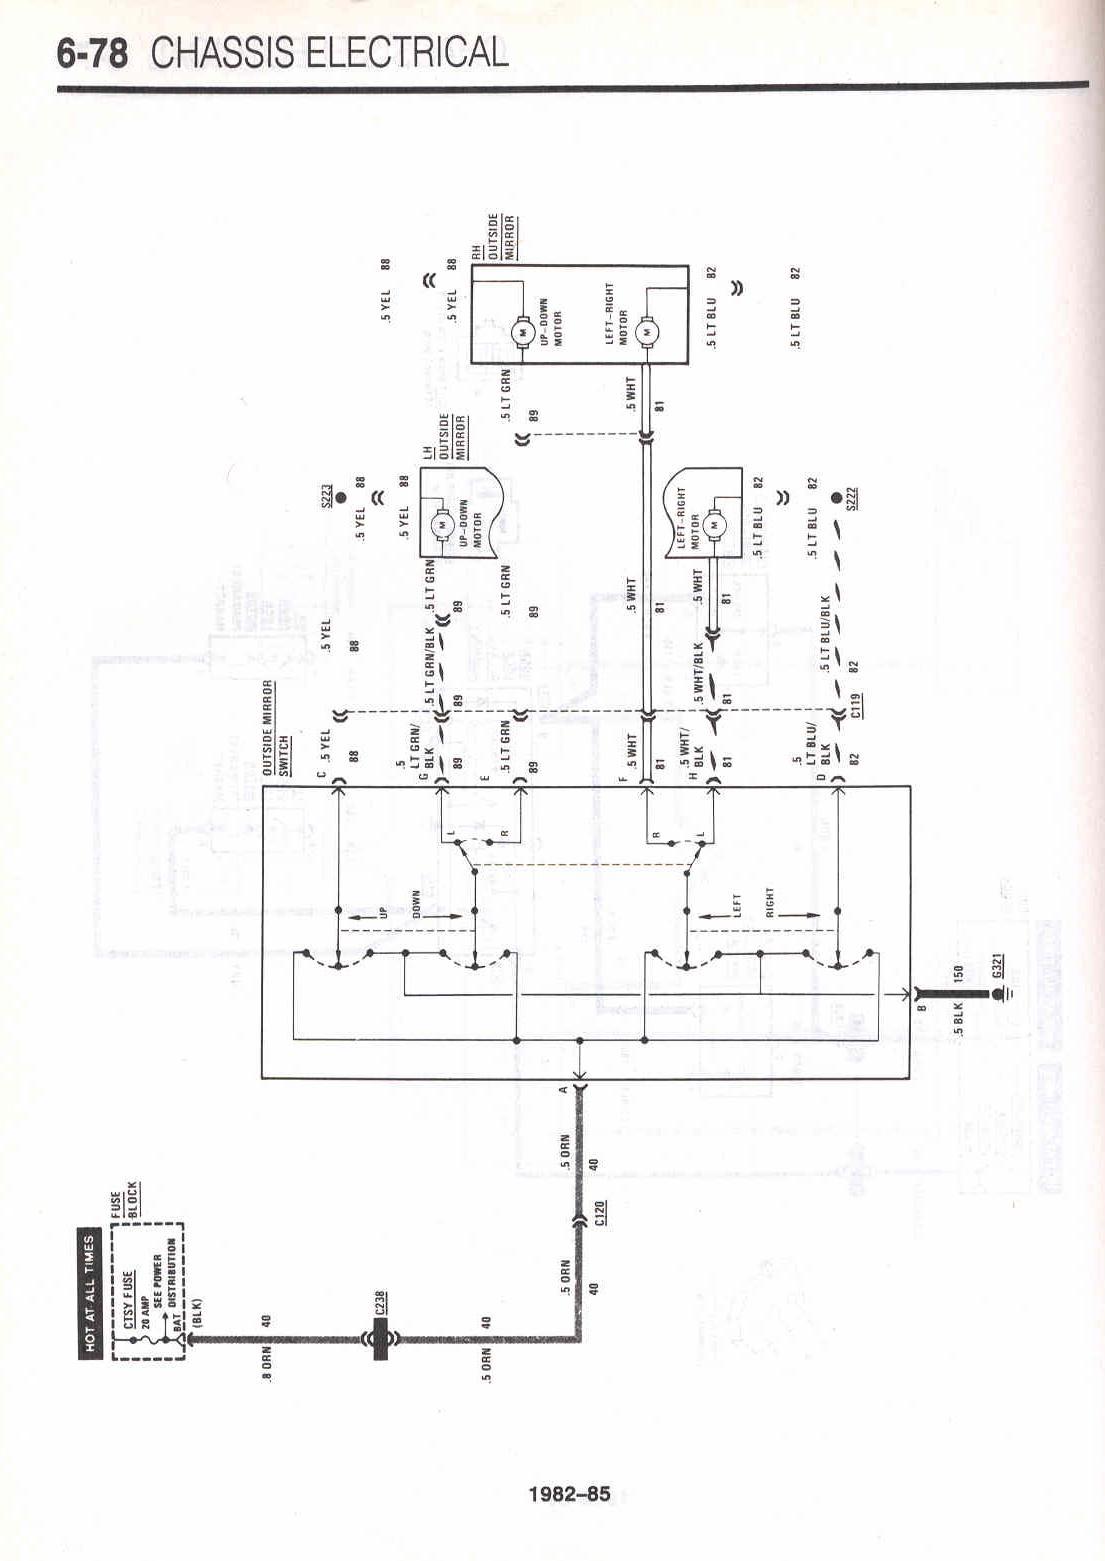 84 Bayou 300 Schematic Wiring Piping Schematics Www Kawasaki Kvf300 Diagram